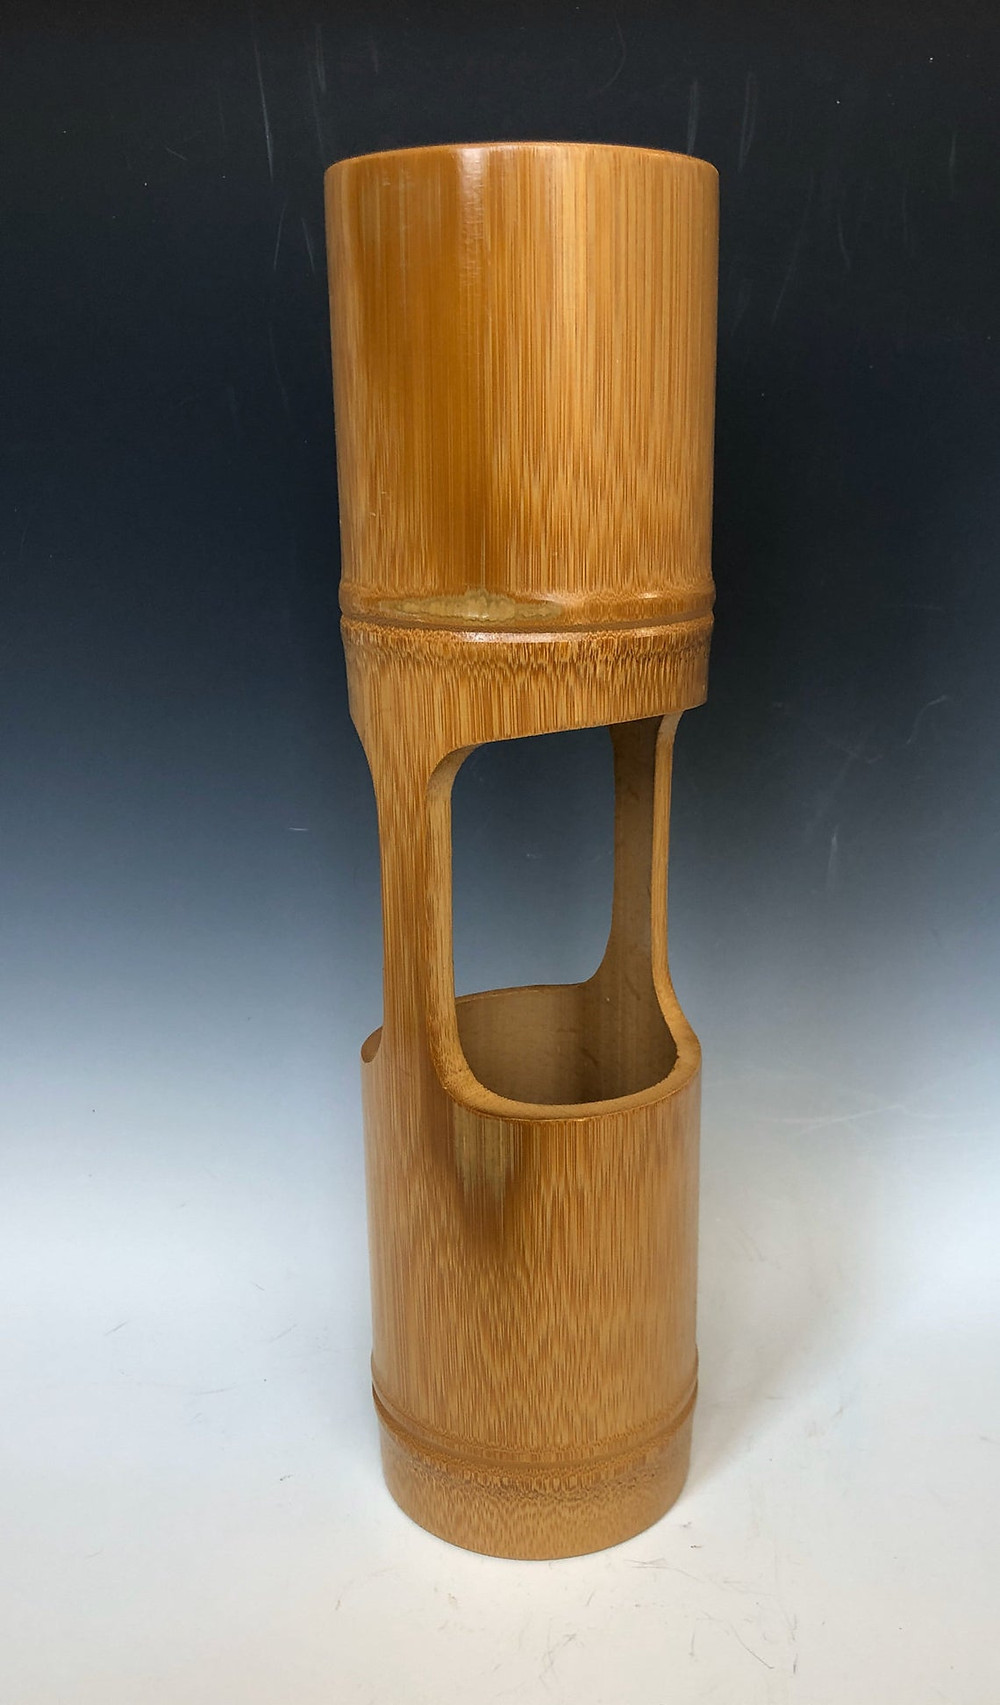 Bamboo cylinder vase for ikebana.